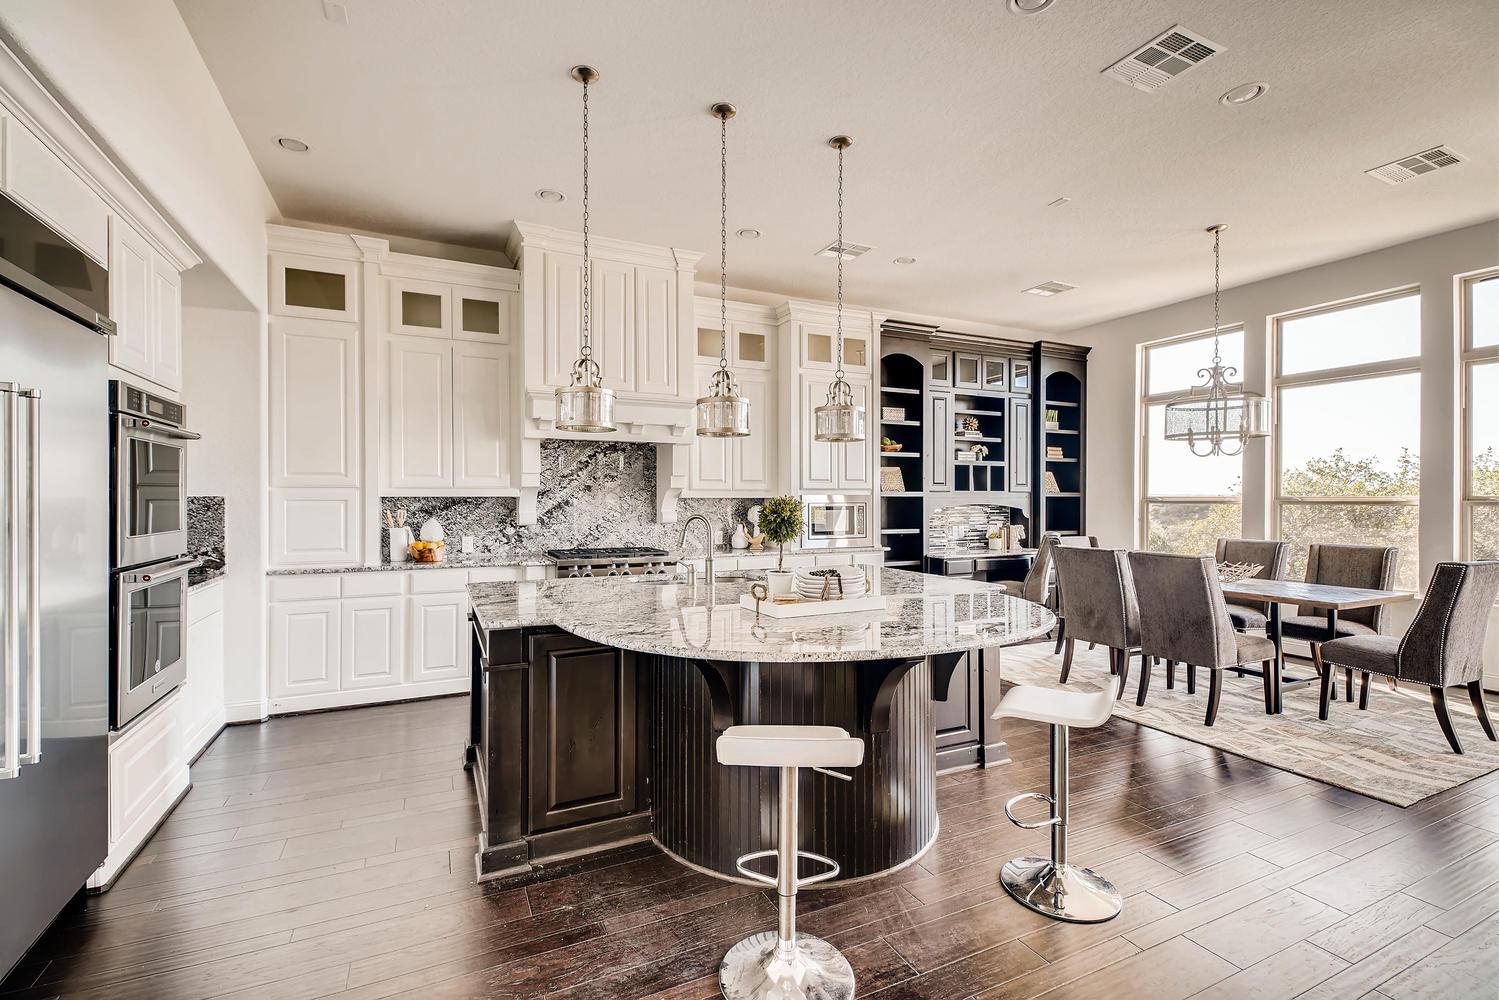 7847 Vanity Hill San Antonio-large-013-11-Kitchen-1500x1000-72dpi.jpg